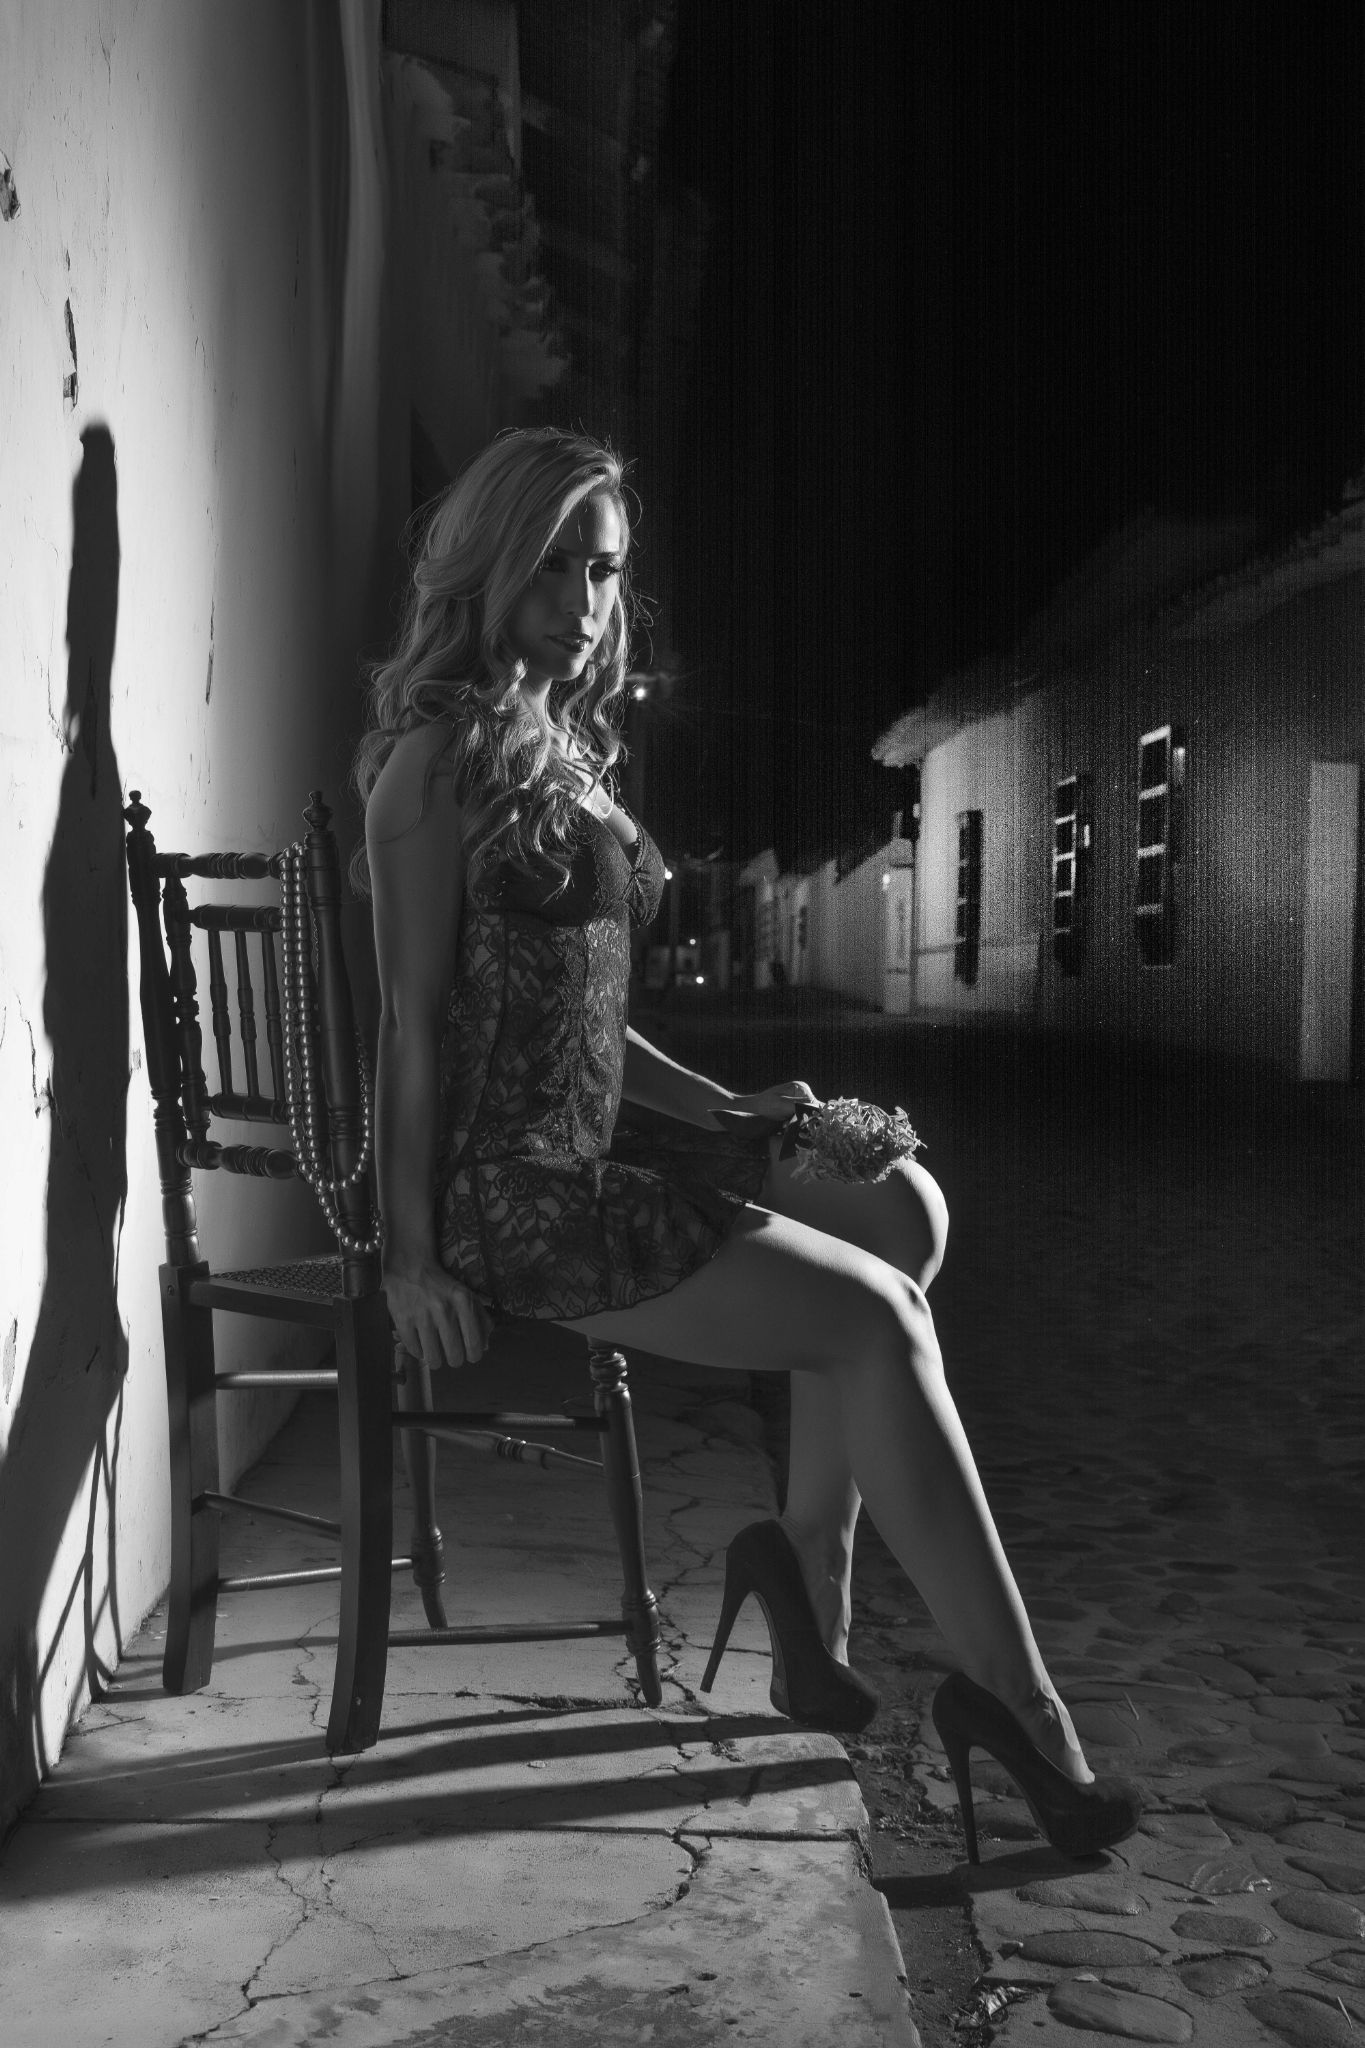 dama de la noche by FERNANDO FERRO